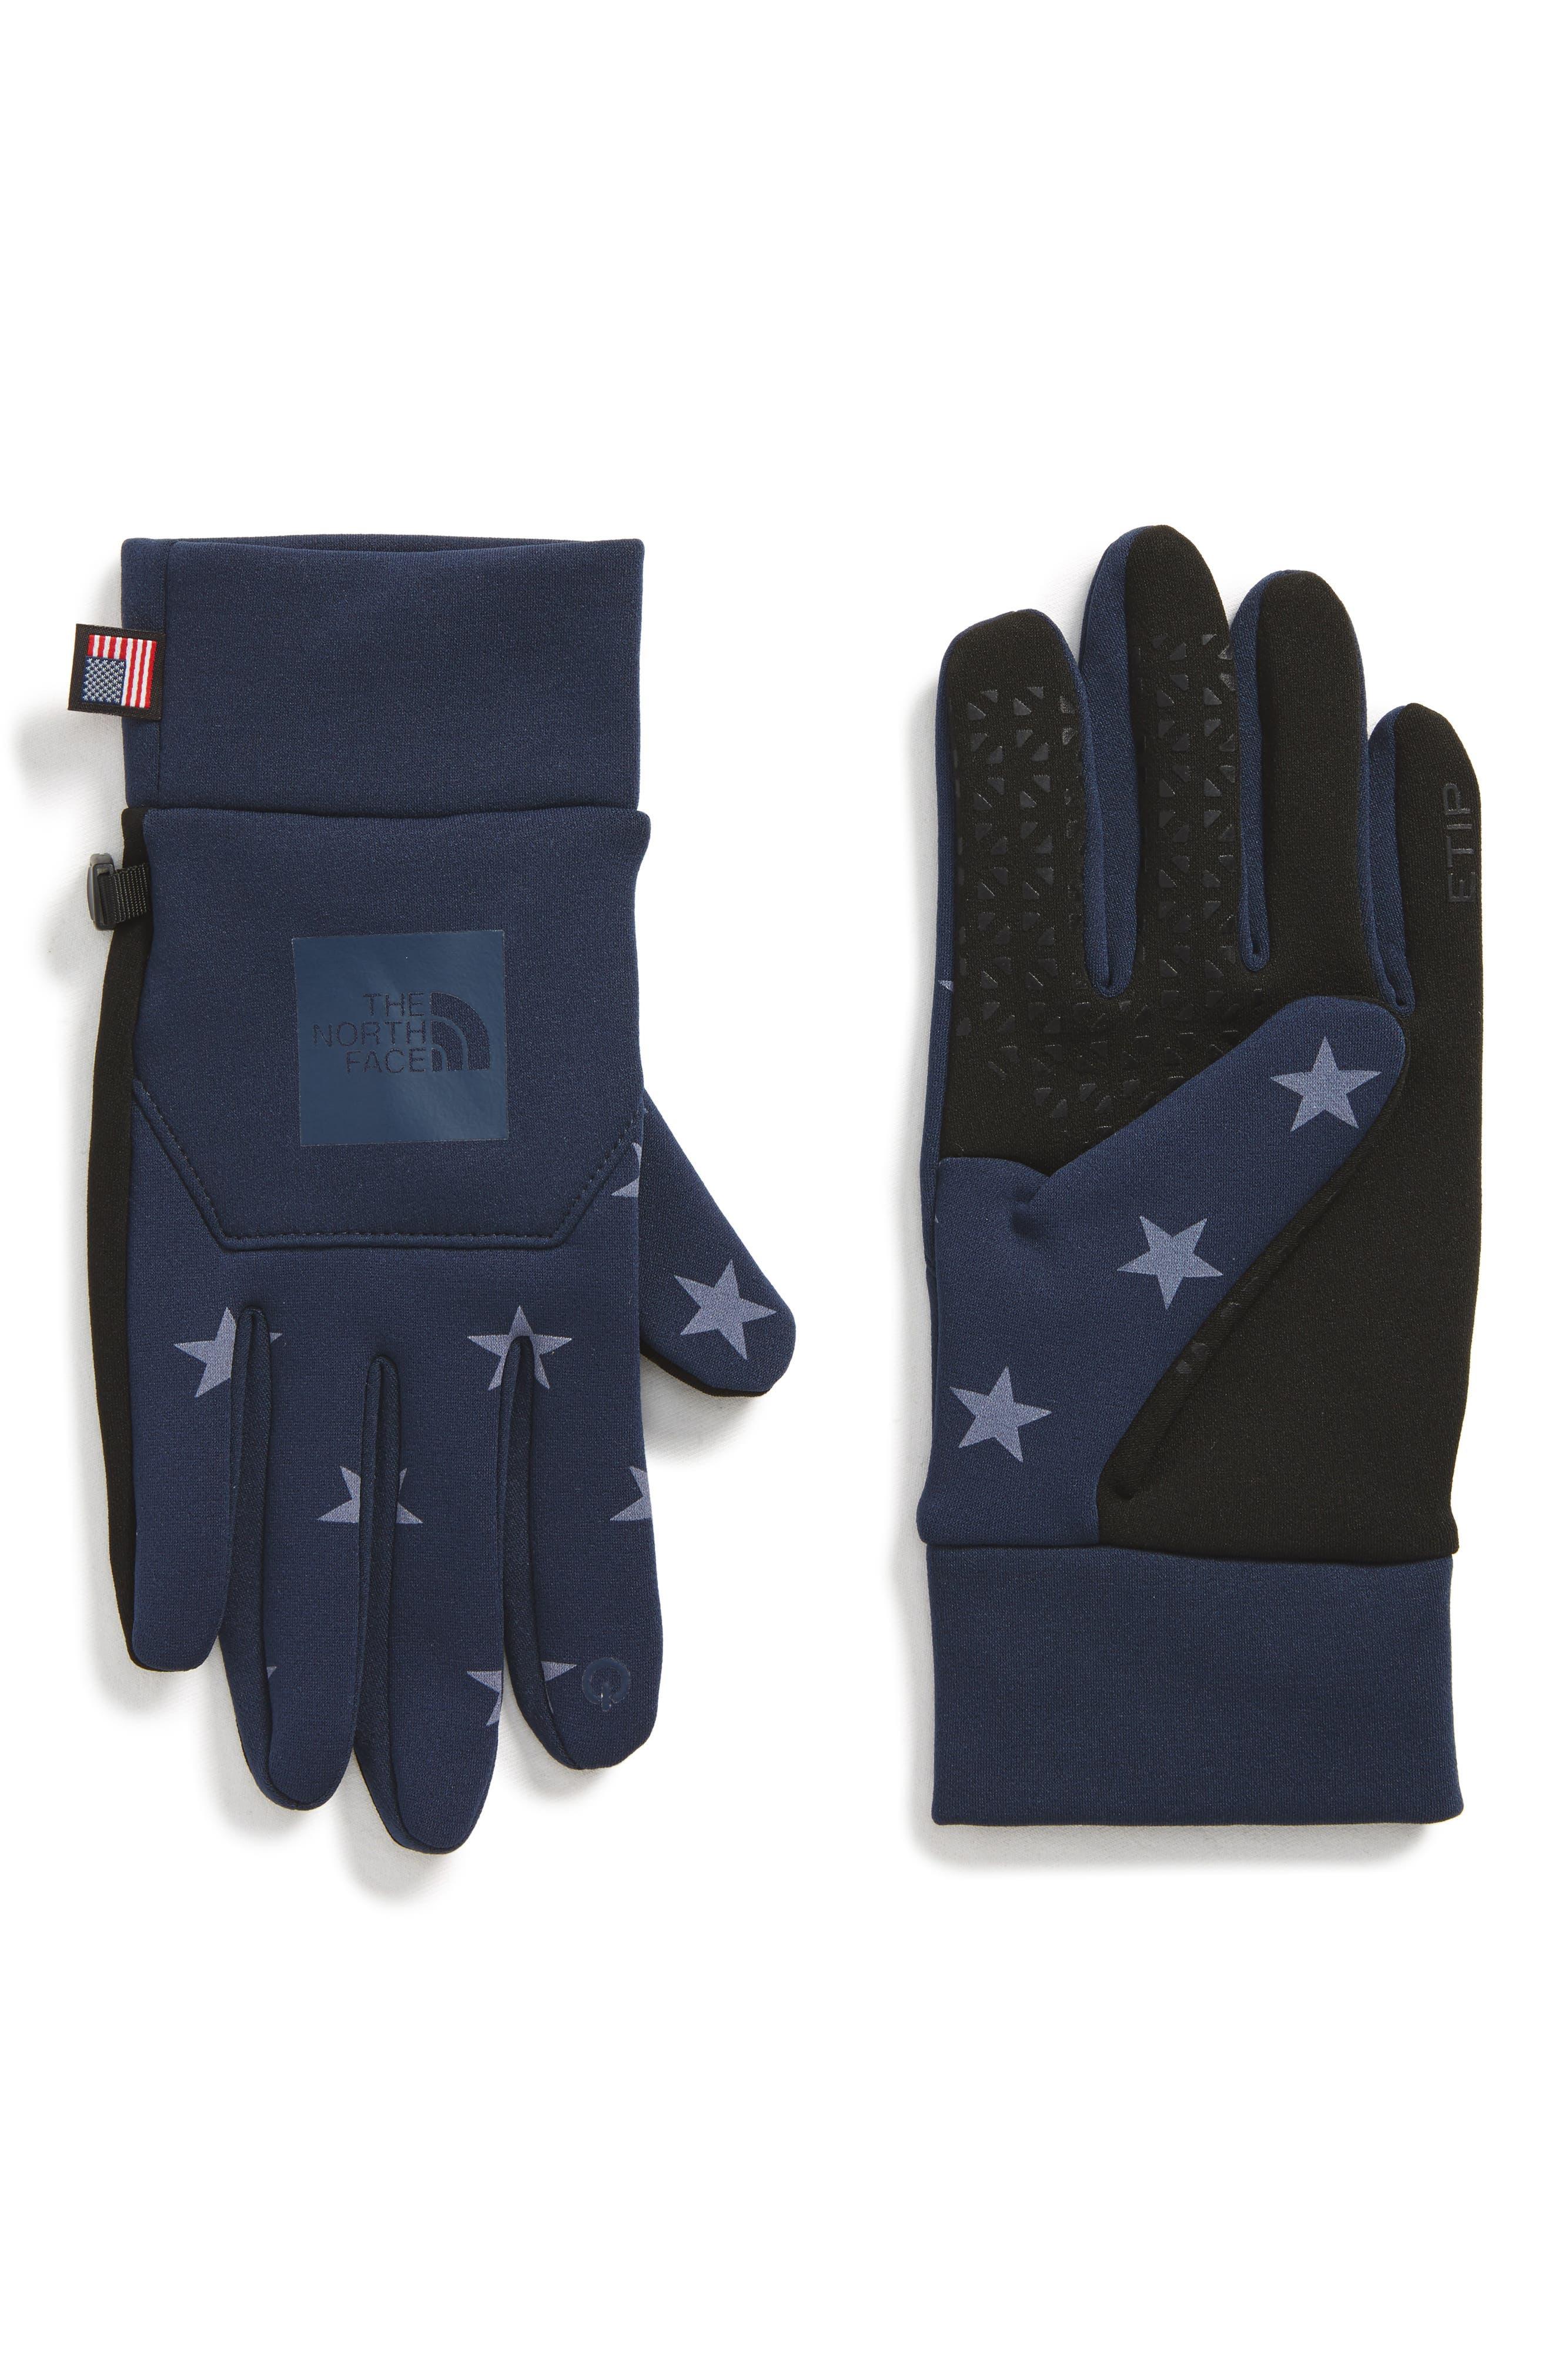 International Collection E-Tip Gloves,                             Main thumbnail 3, color,